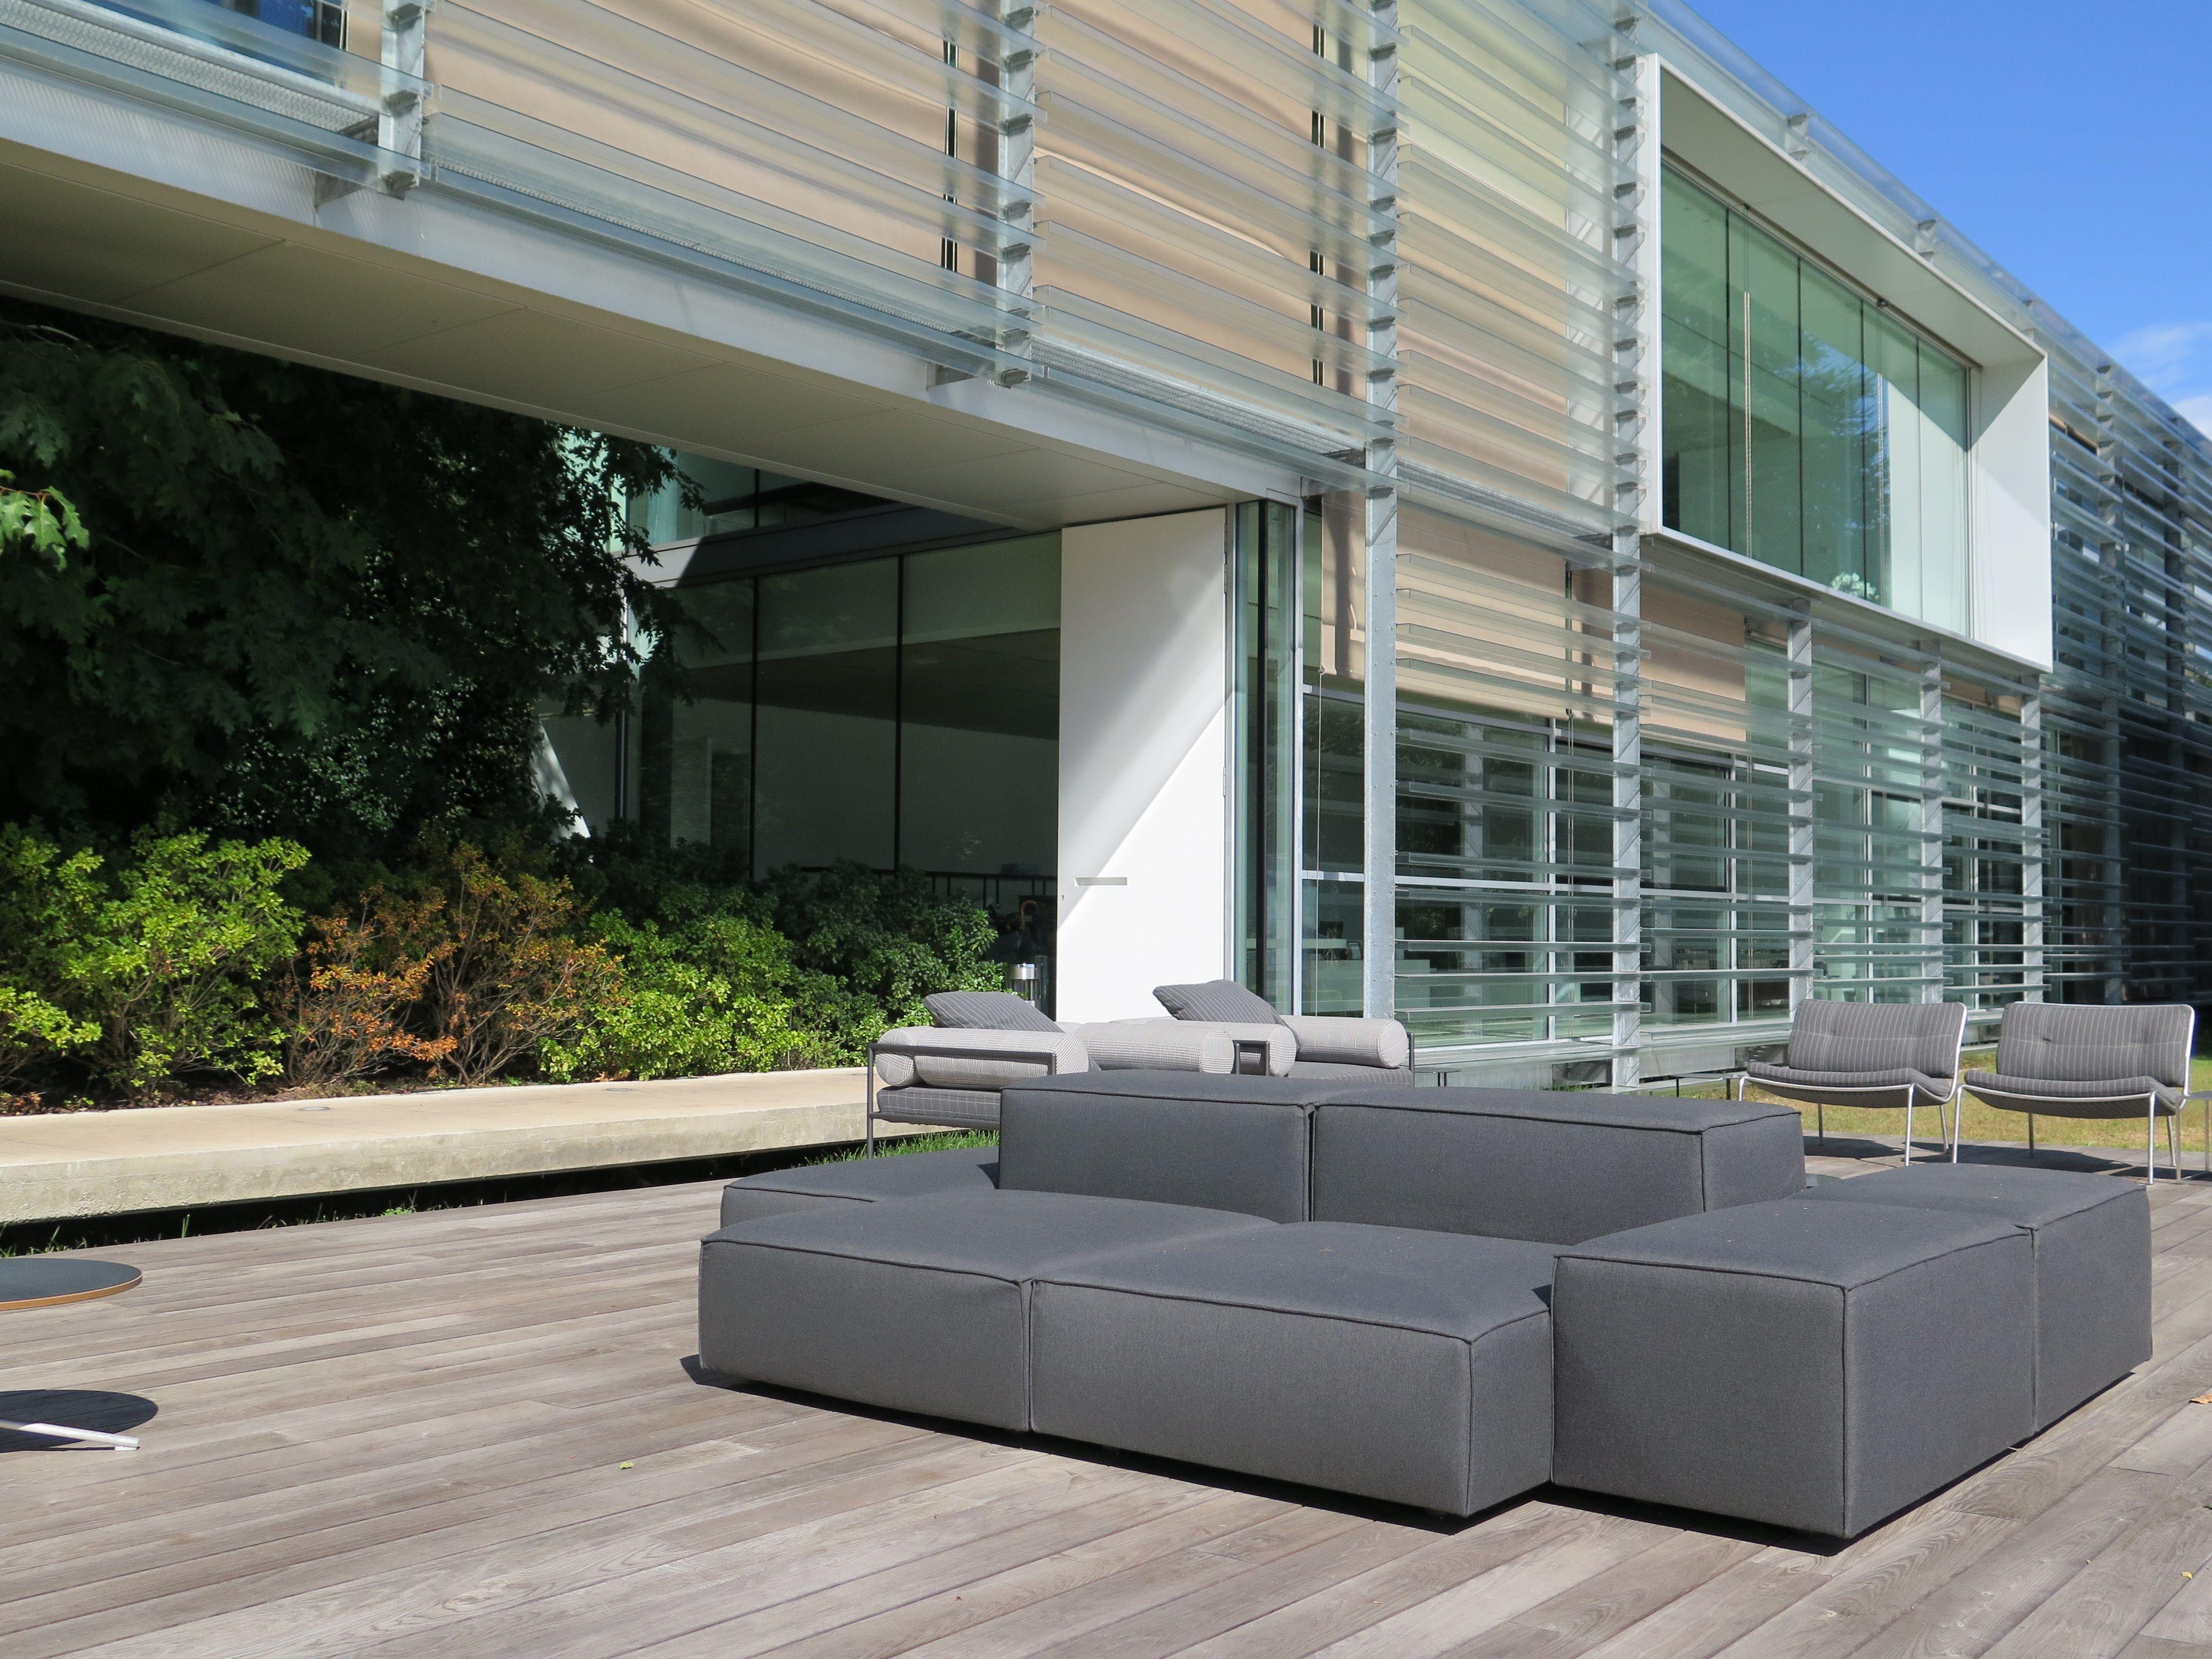 Living Divani Bubble Rock outdoor seating by Piero Lissoni